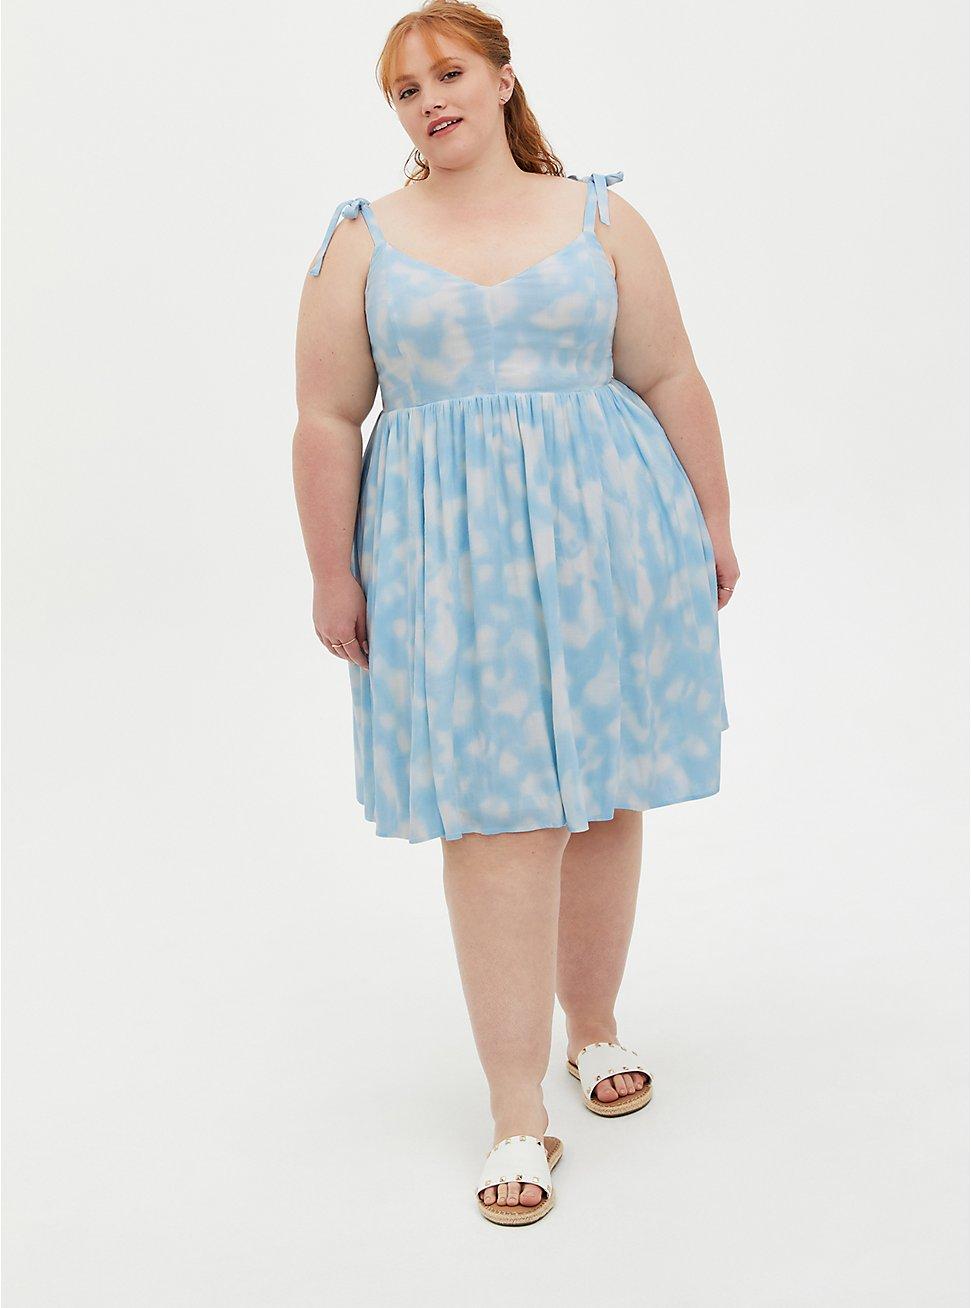 Blue Tie-Dye Tie Strap Skater Dress, TIE DYE-BLUE, hi-res